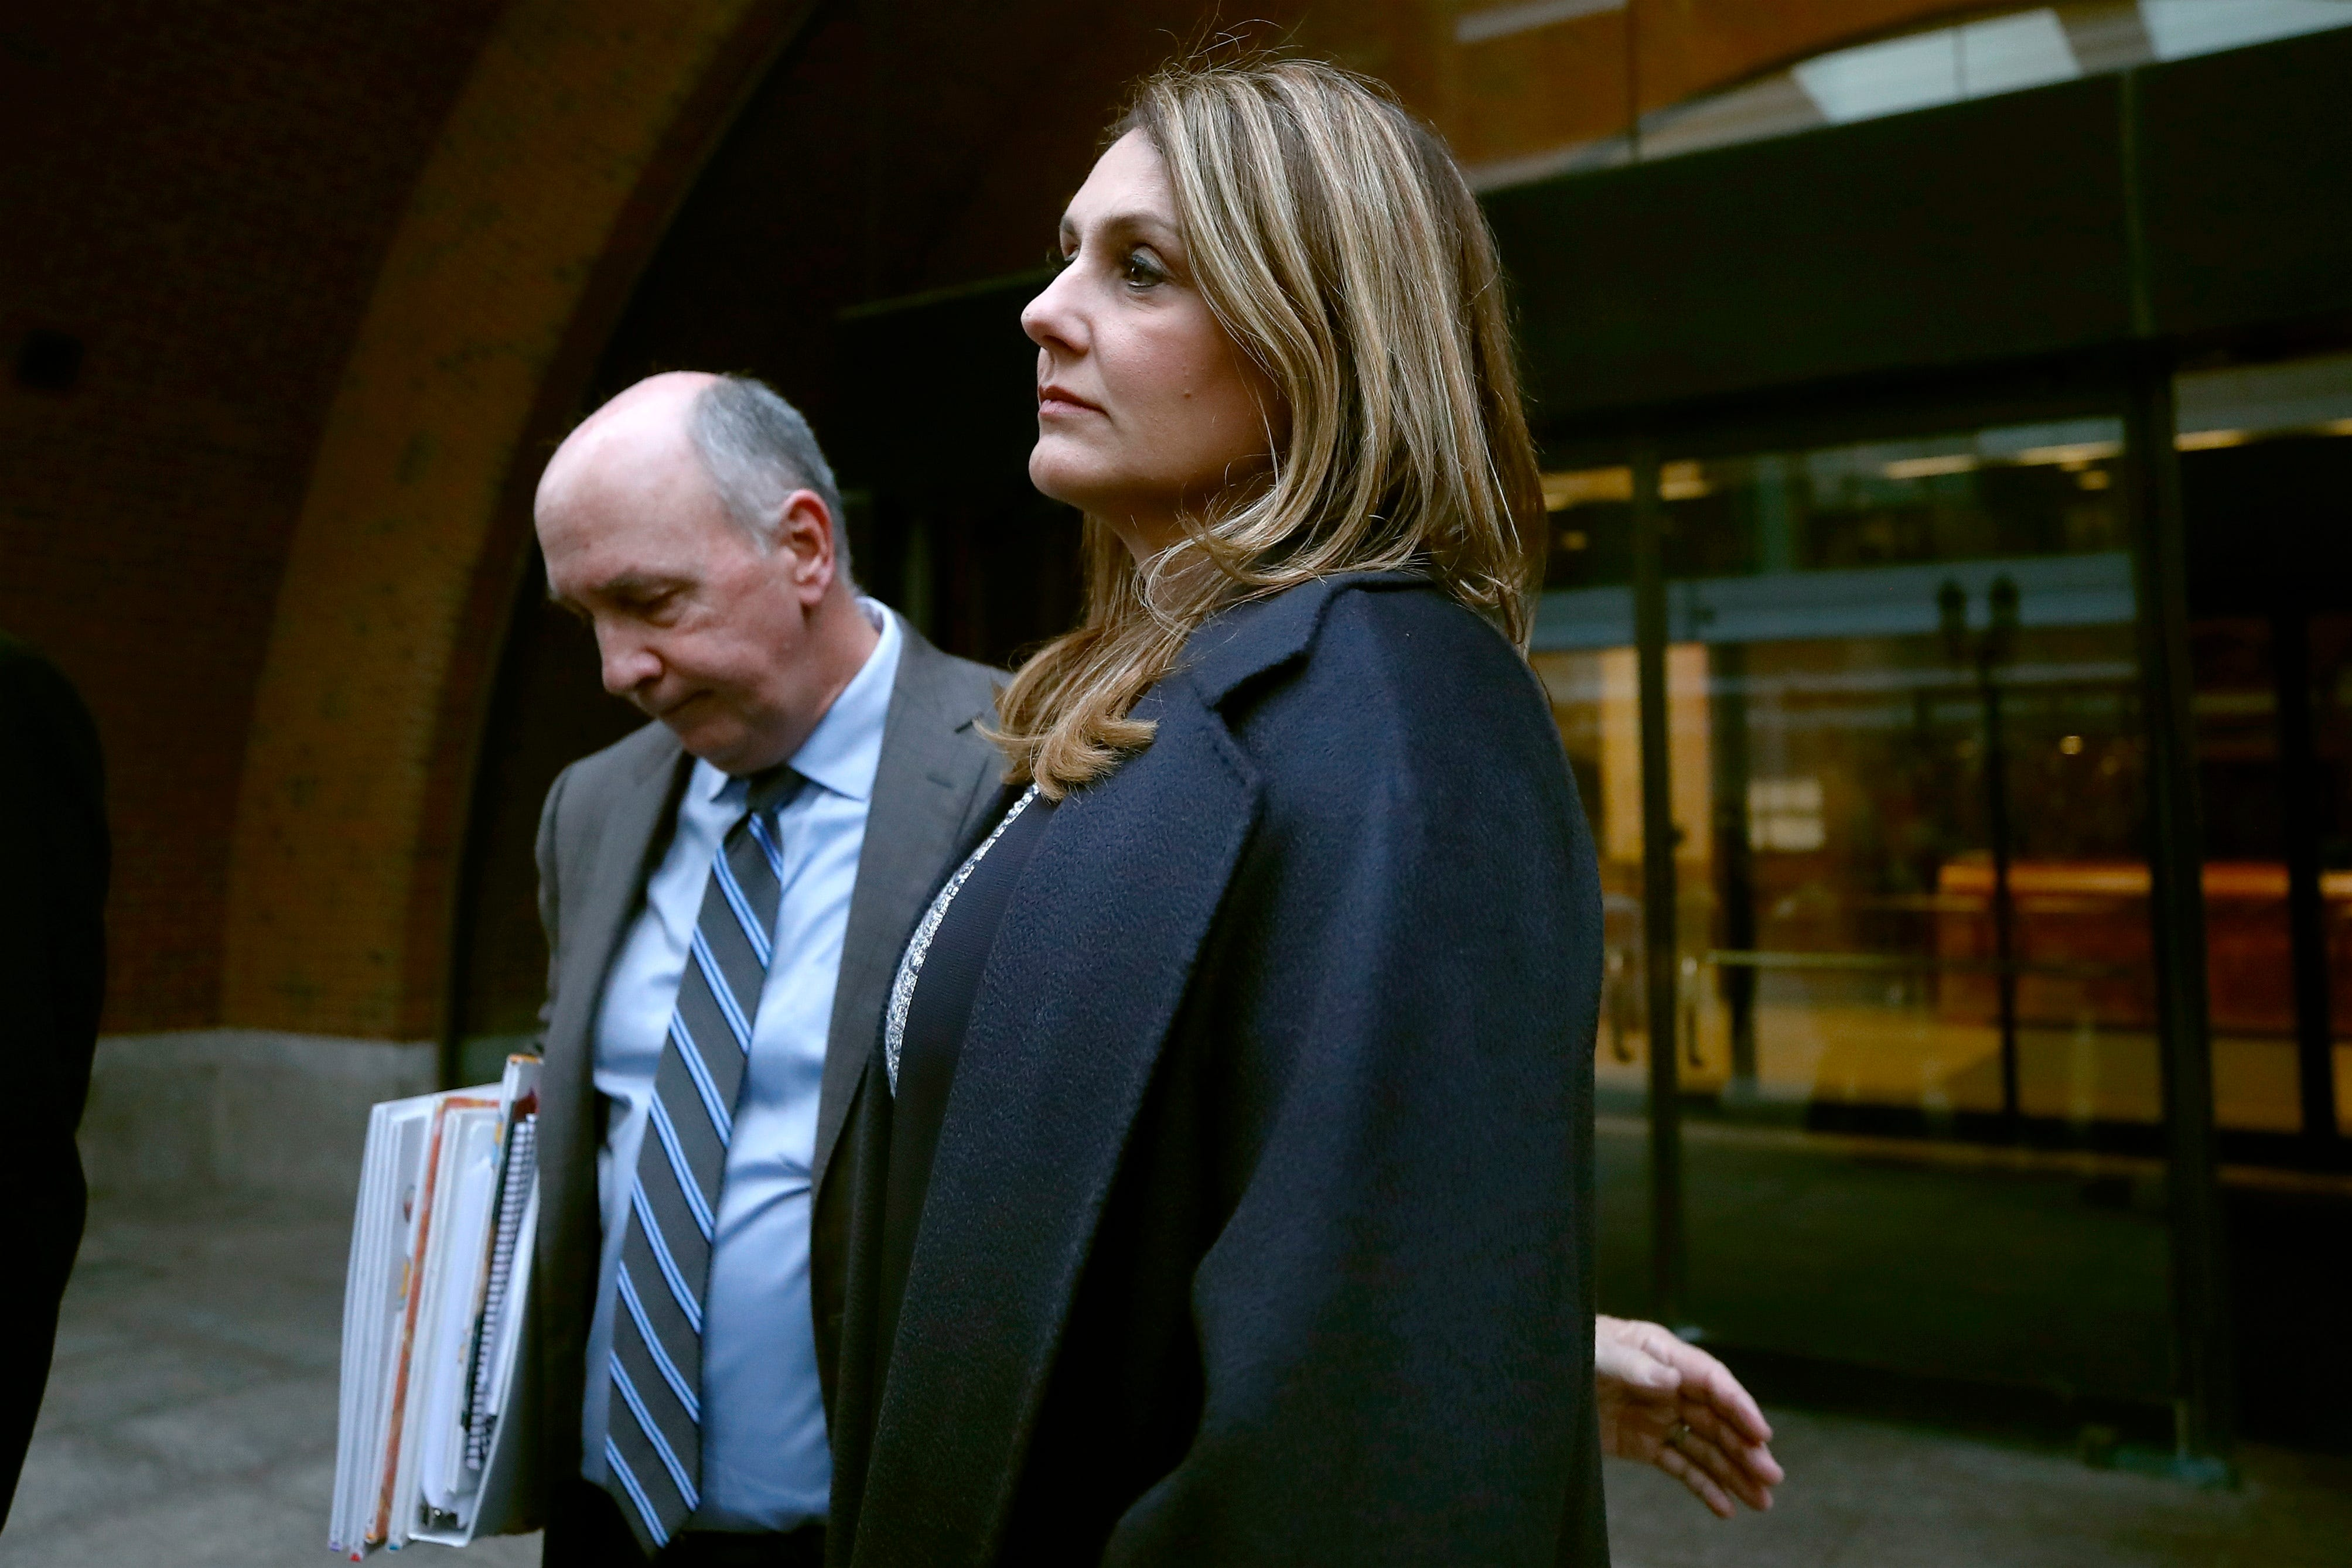 Hot Pockets heiress Michelle Janavs gets 5 months in prison in admissions scandal